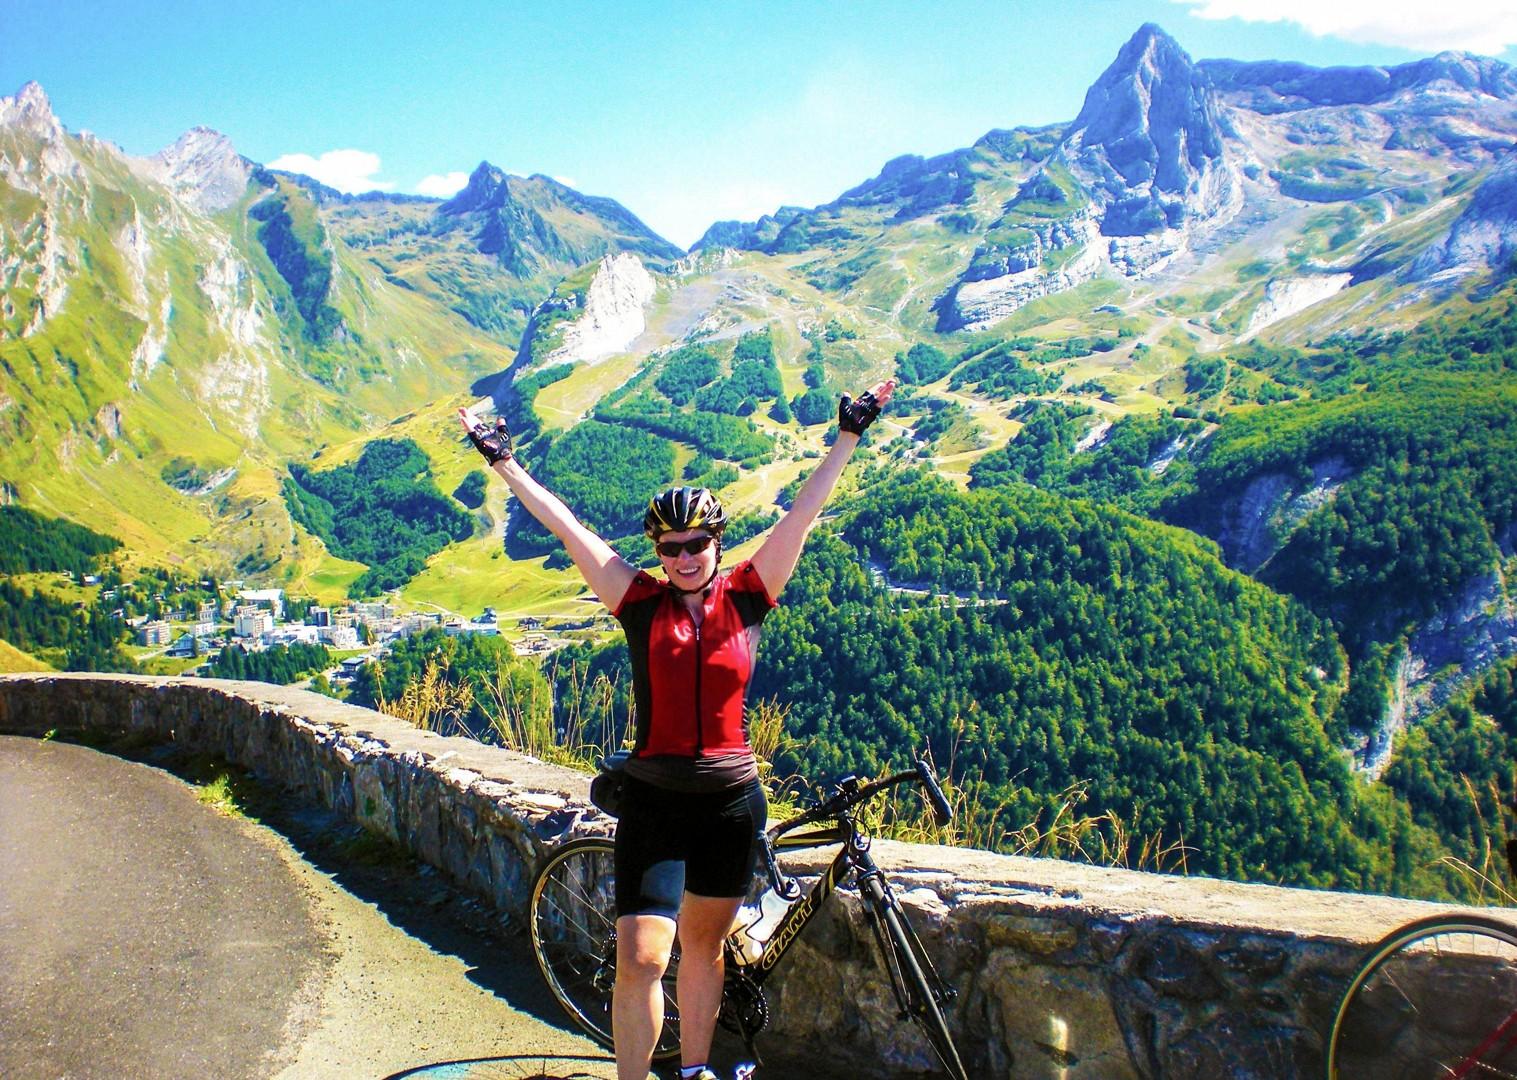 france-cycling-holiday-road-trip-saddle-skedaddle.jpg - France - Pyrenees Fitness Week (Grade 3-4) - Guided Road Cycling Holiday - Road Cycling